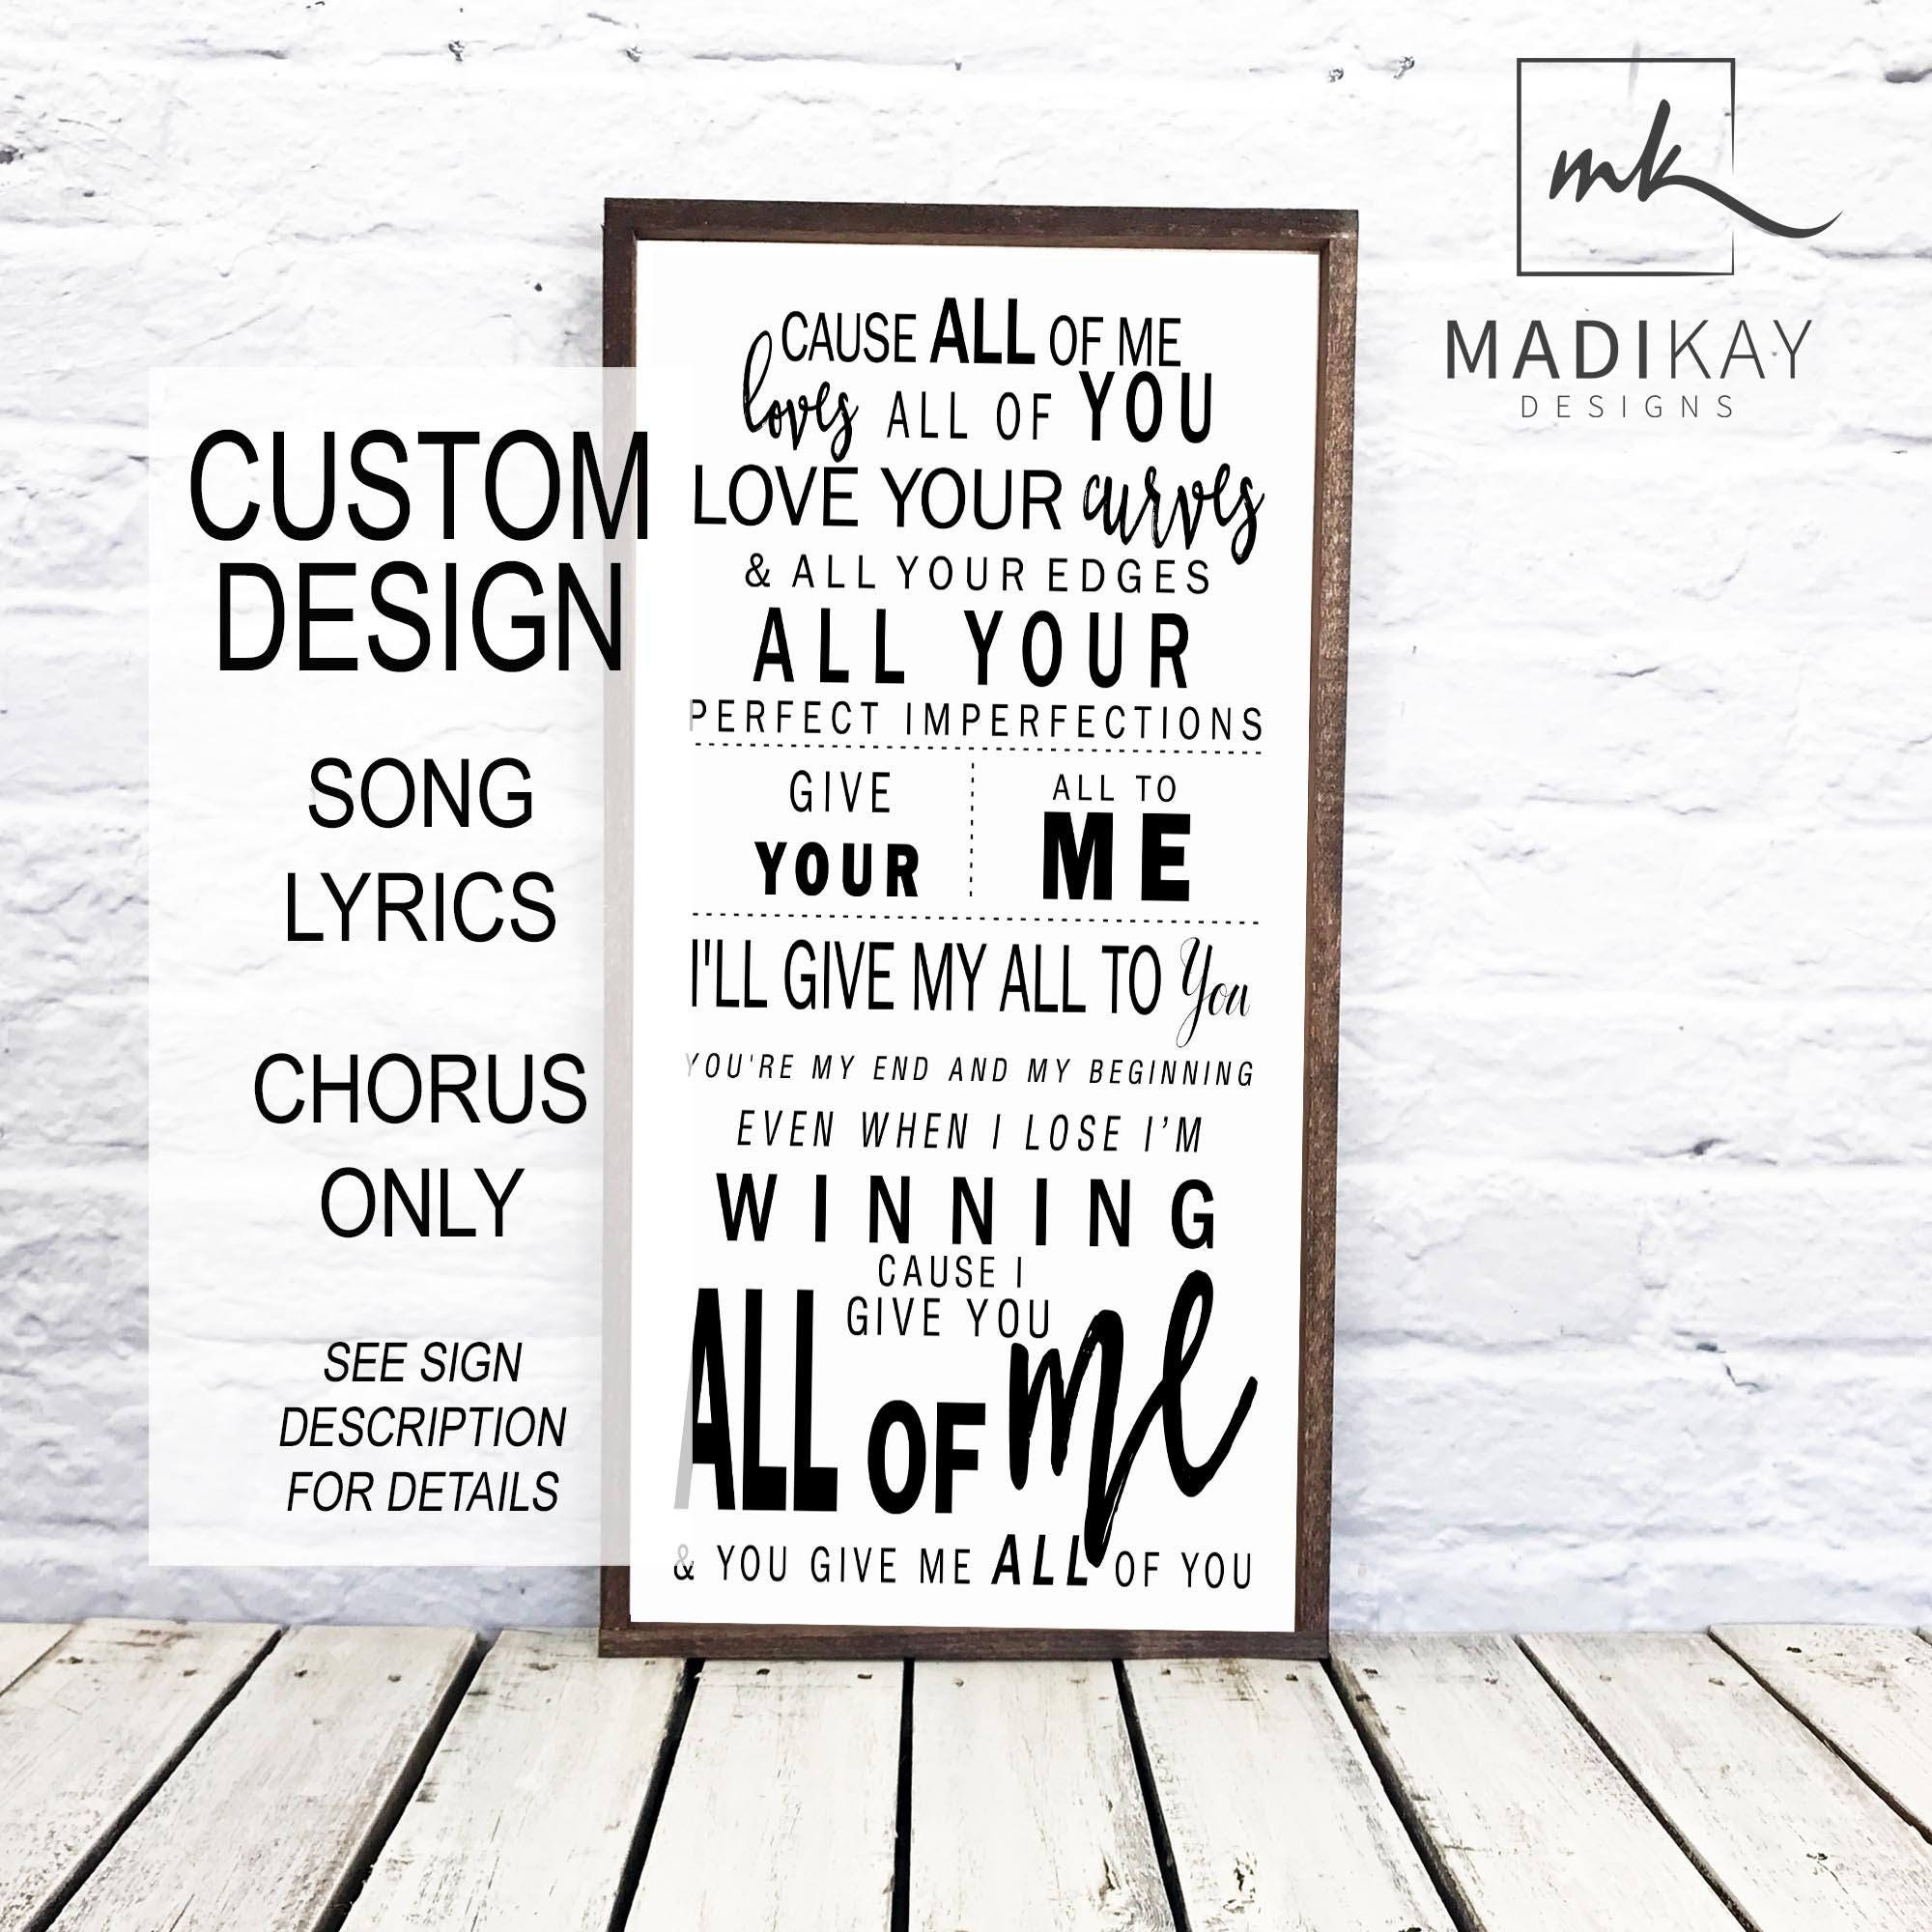 Turn Around Wedding Song: Wedding Song Lyric Frame Song Lyrics Personalize Wood Sign